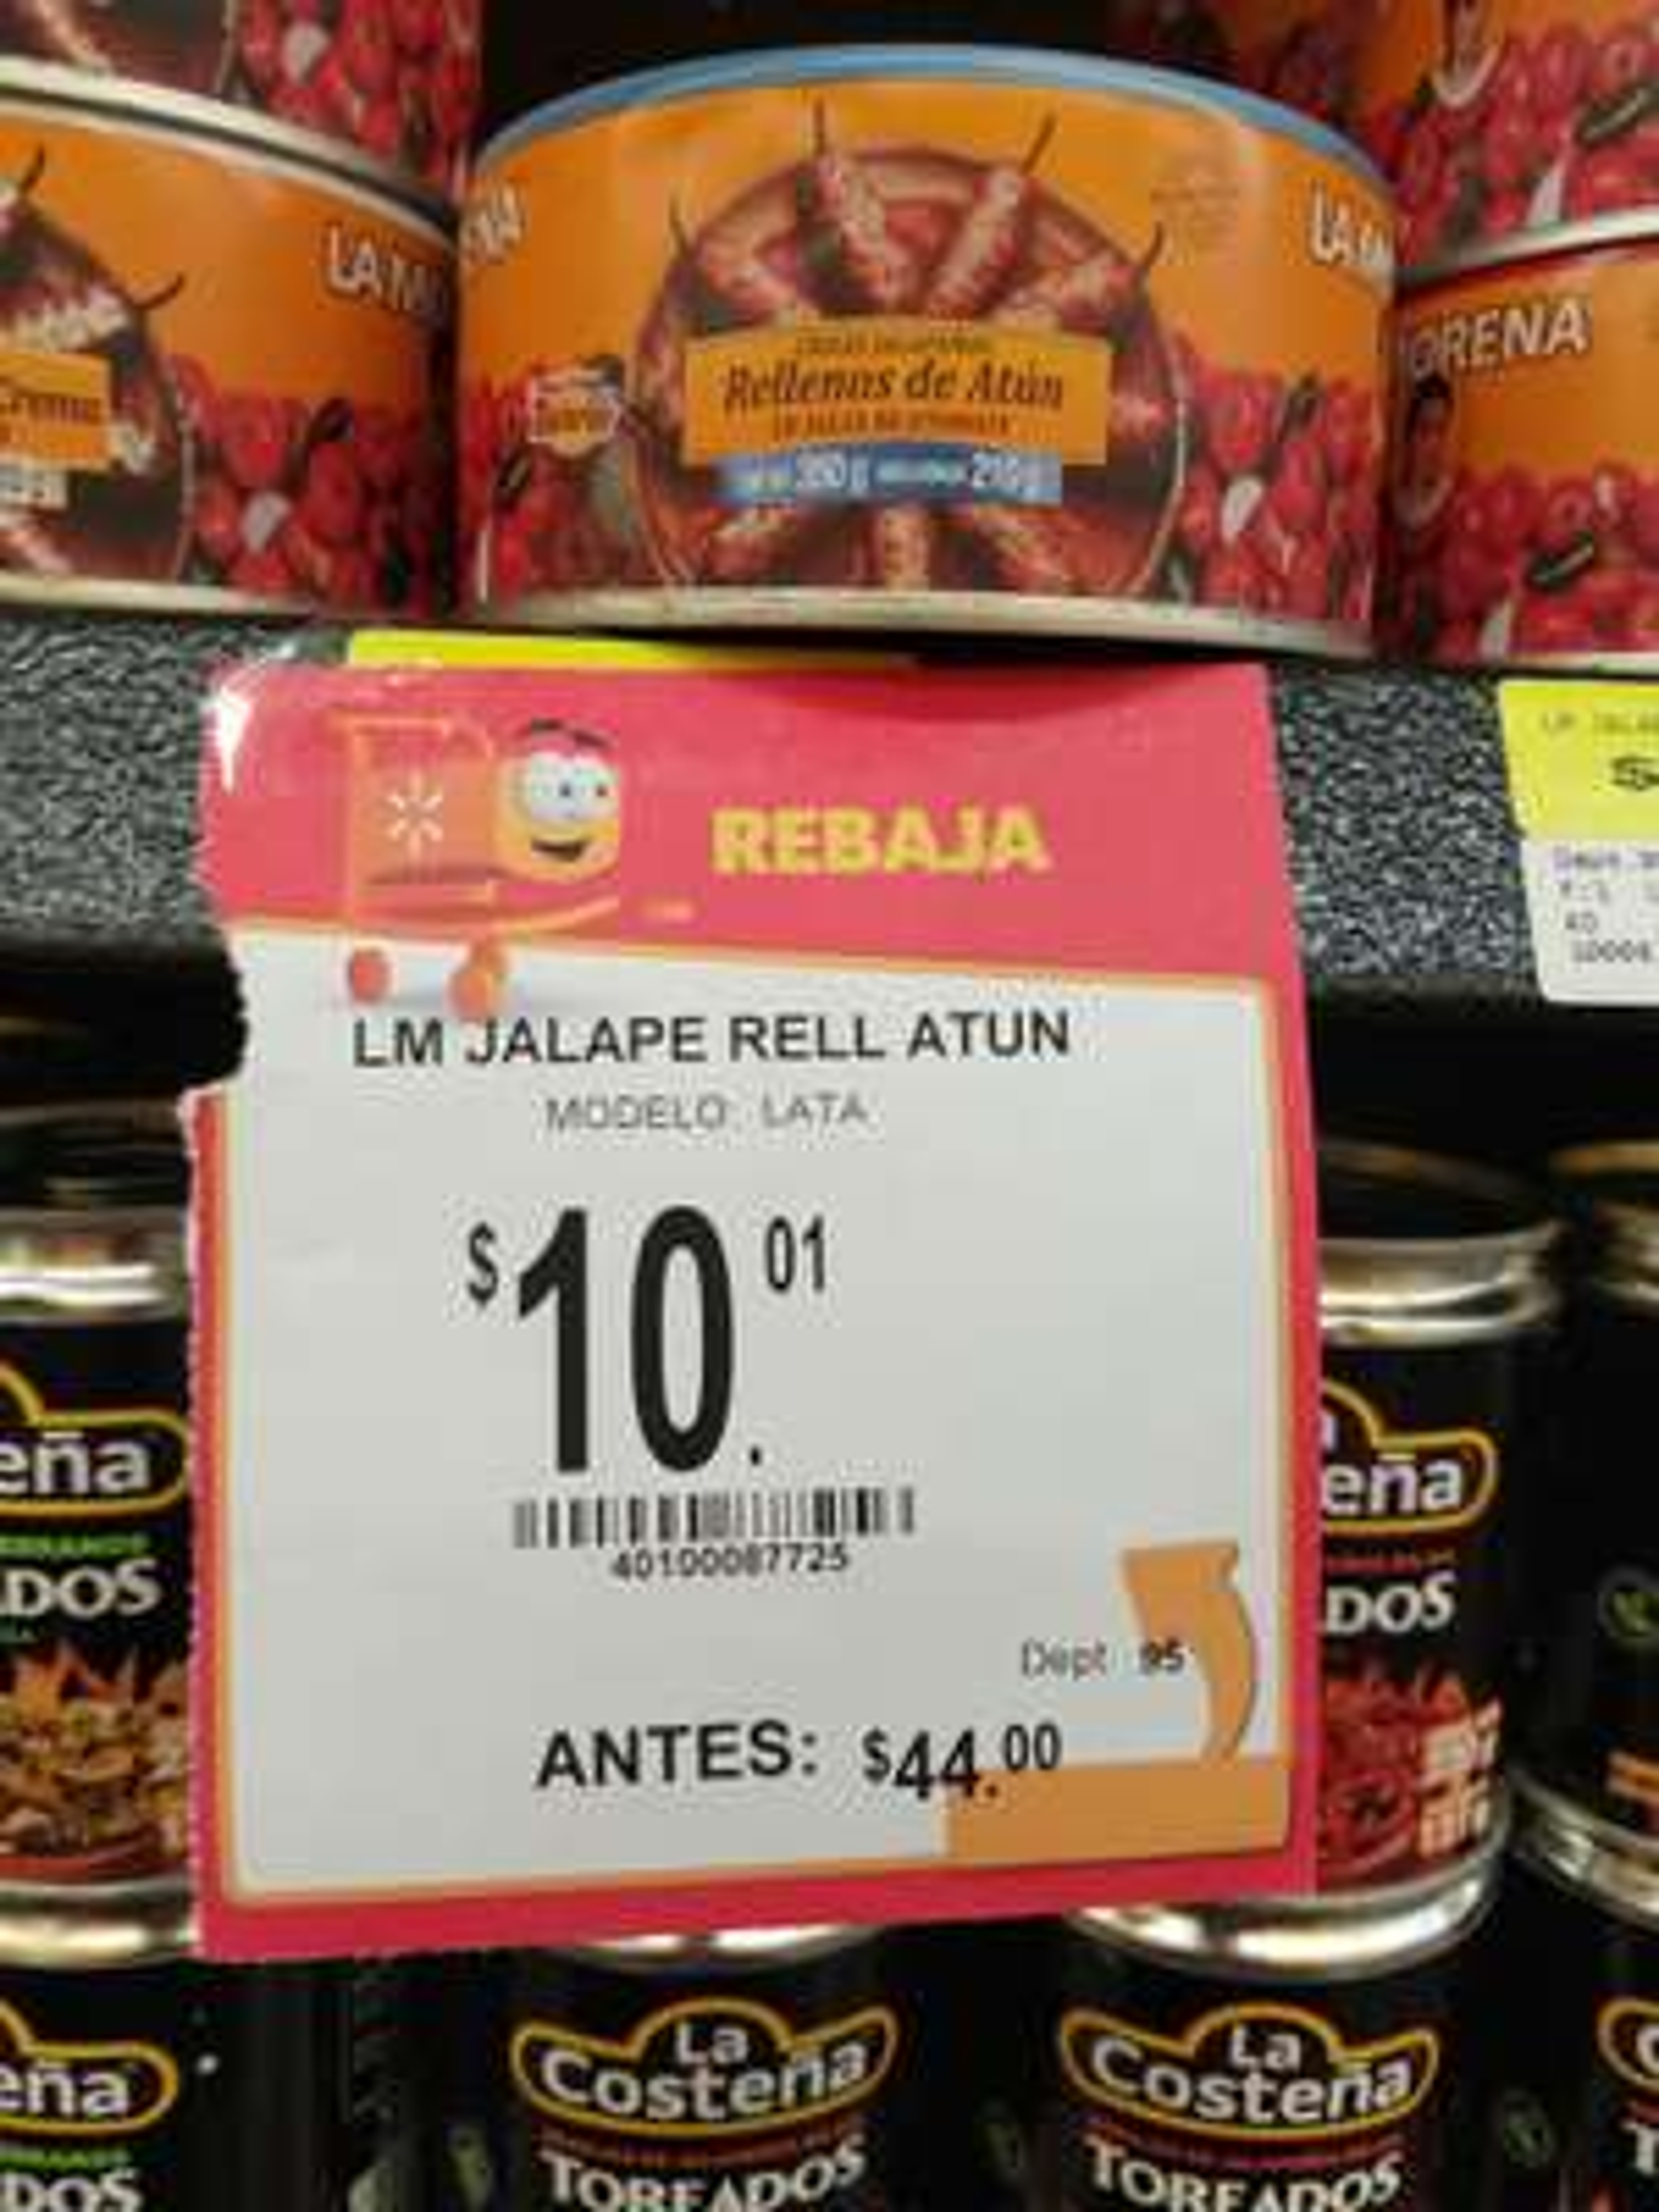 Walmart : Chiles jalapeños rellenos de atún $10.01